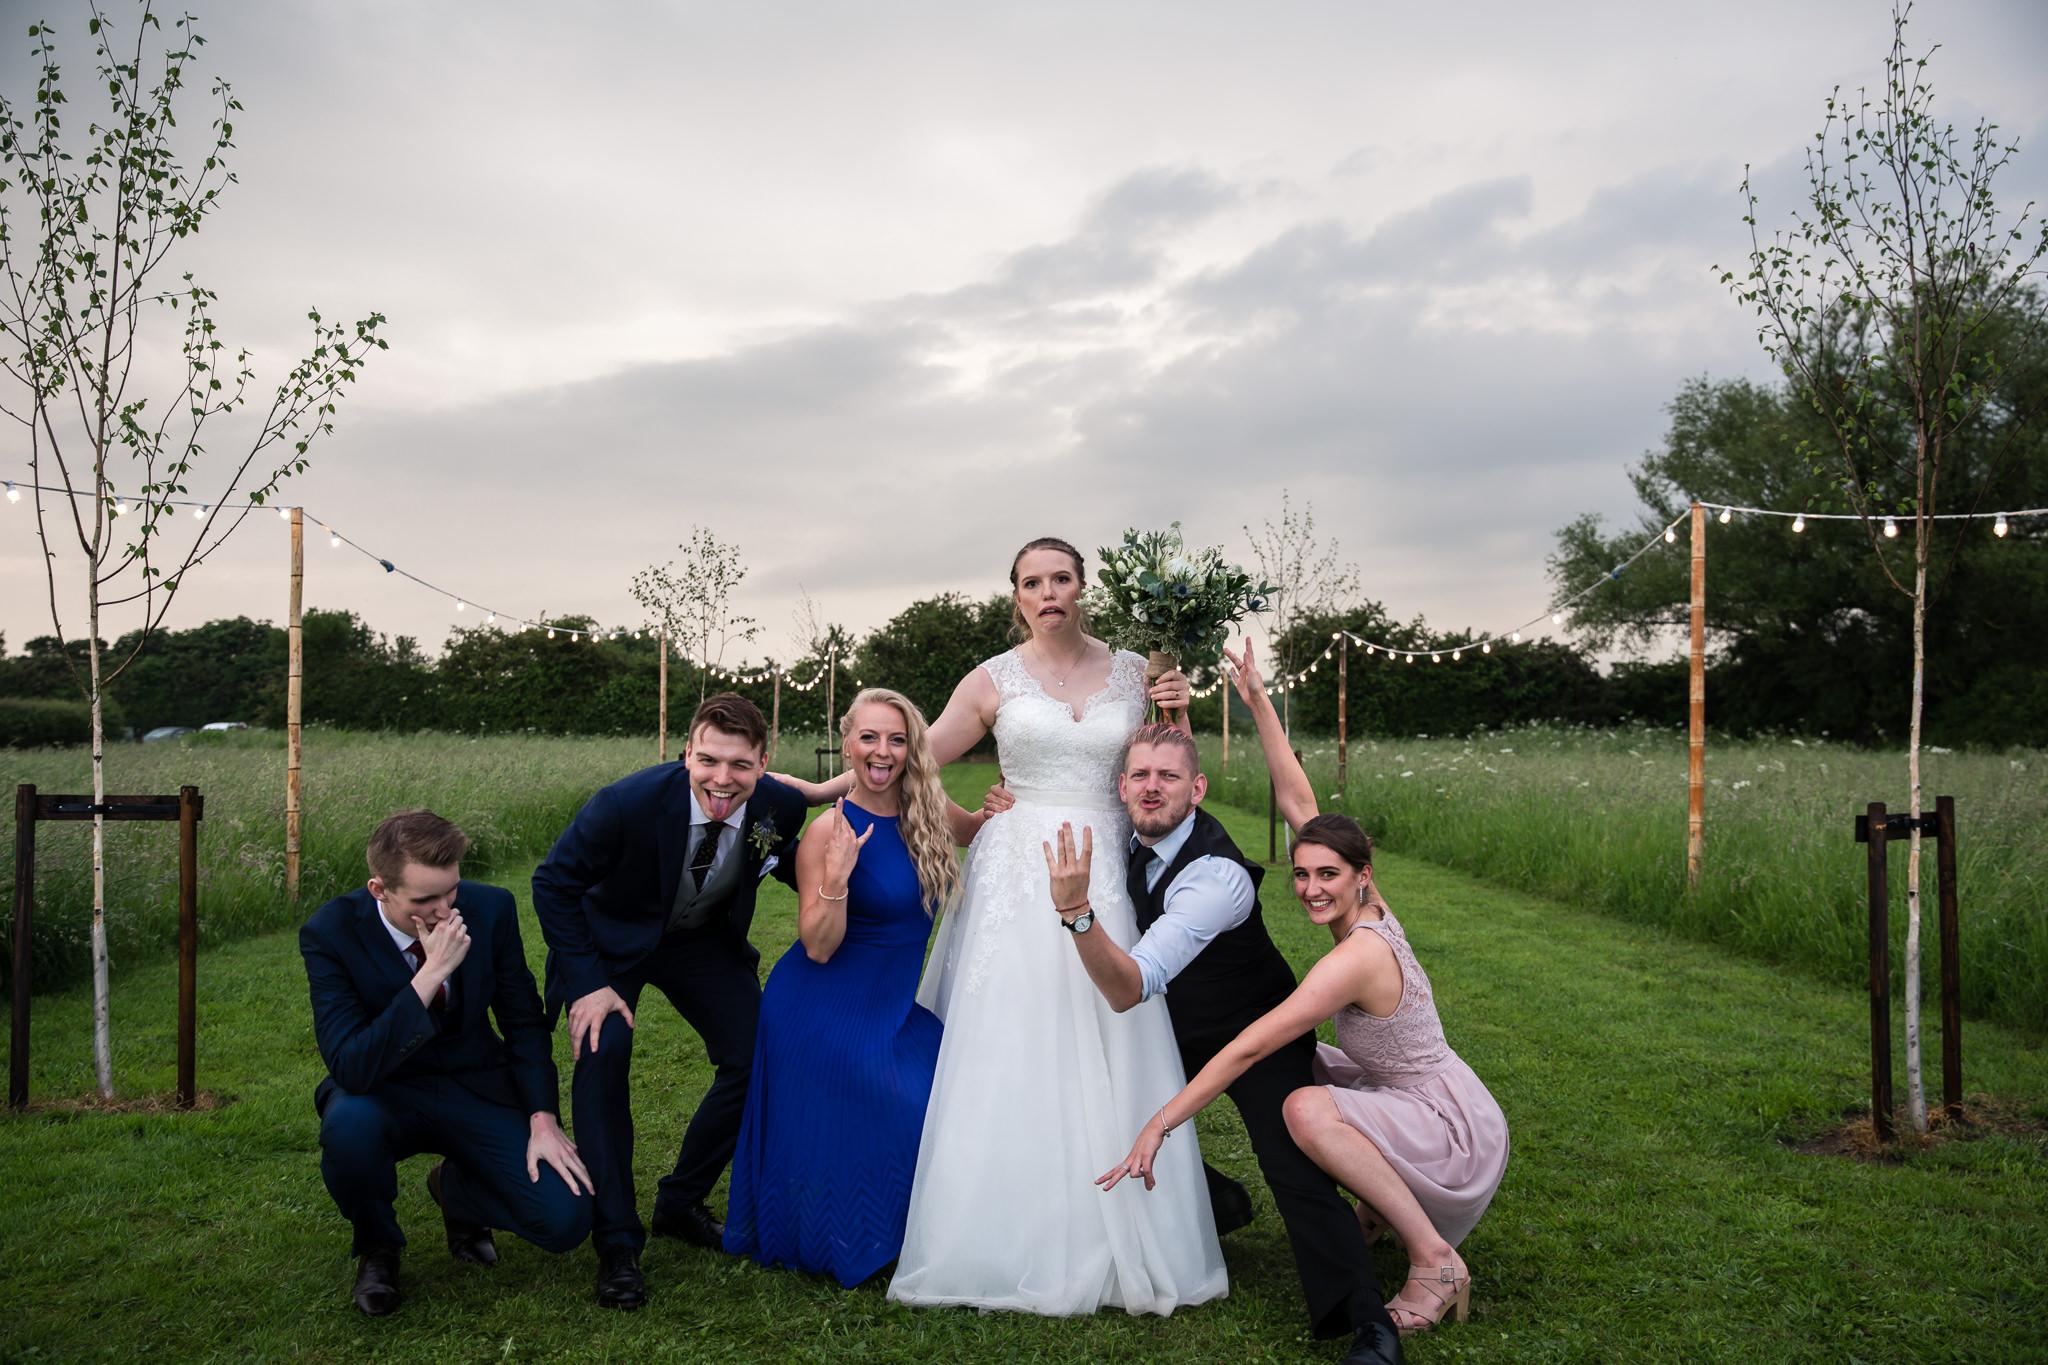 nottingham wedding70